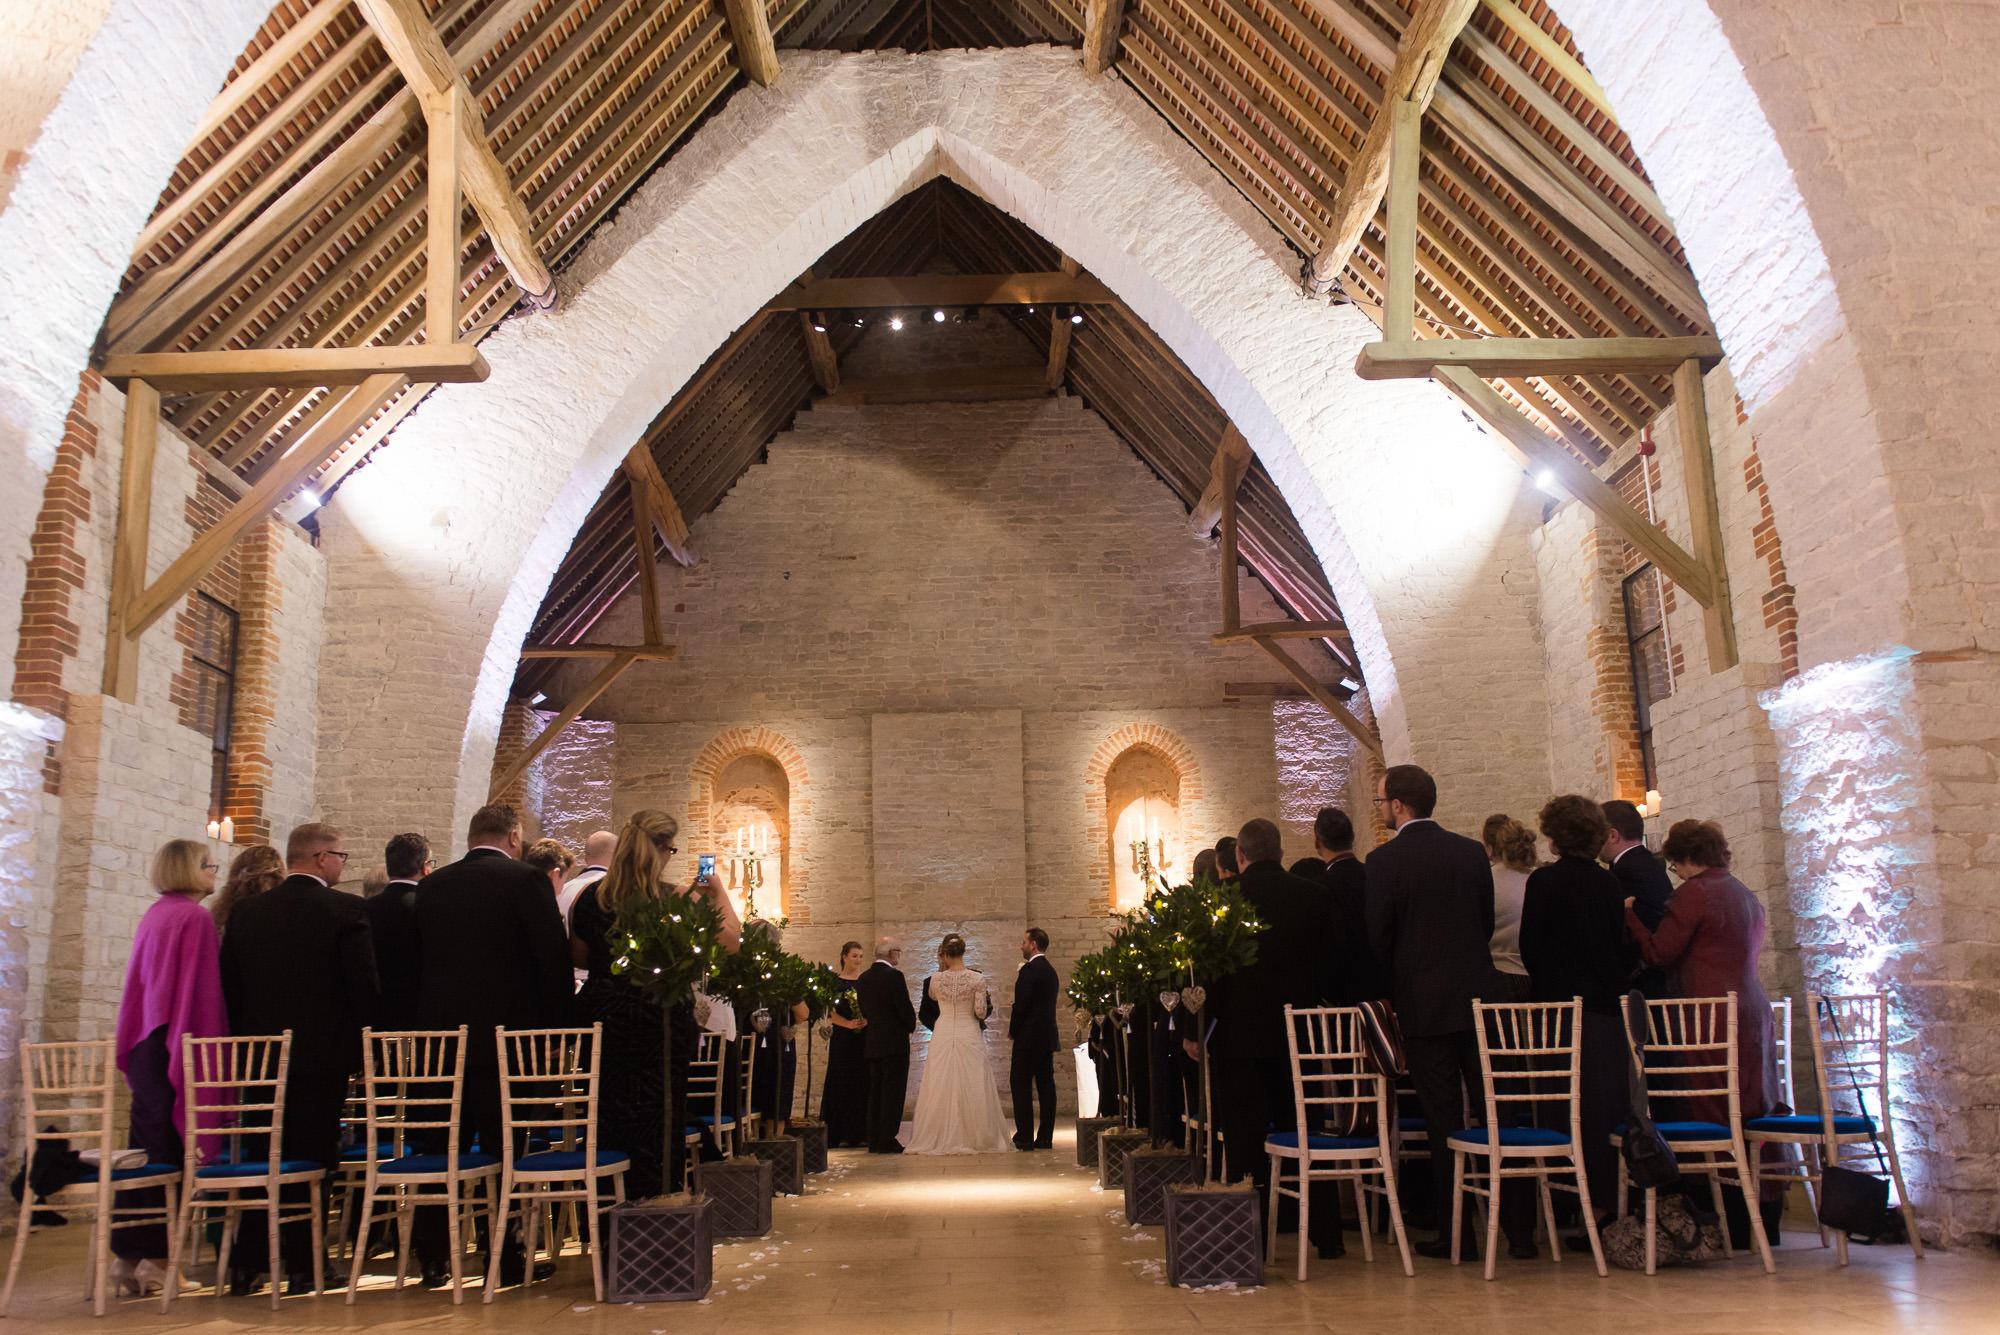 The Tithe Barn Winter Wedding Of Abby And Jon Wedding